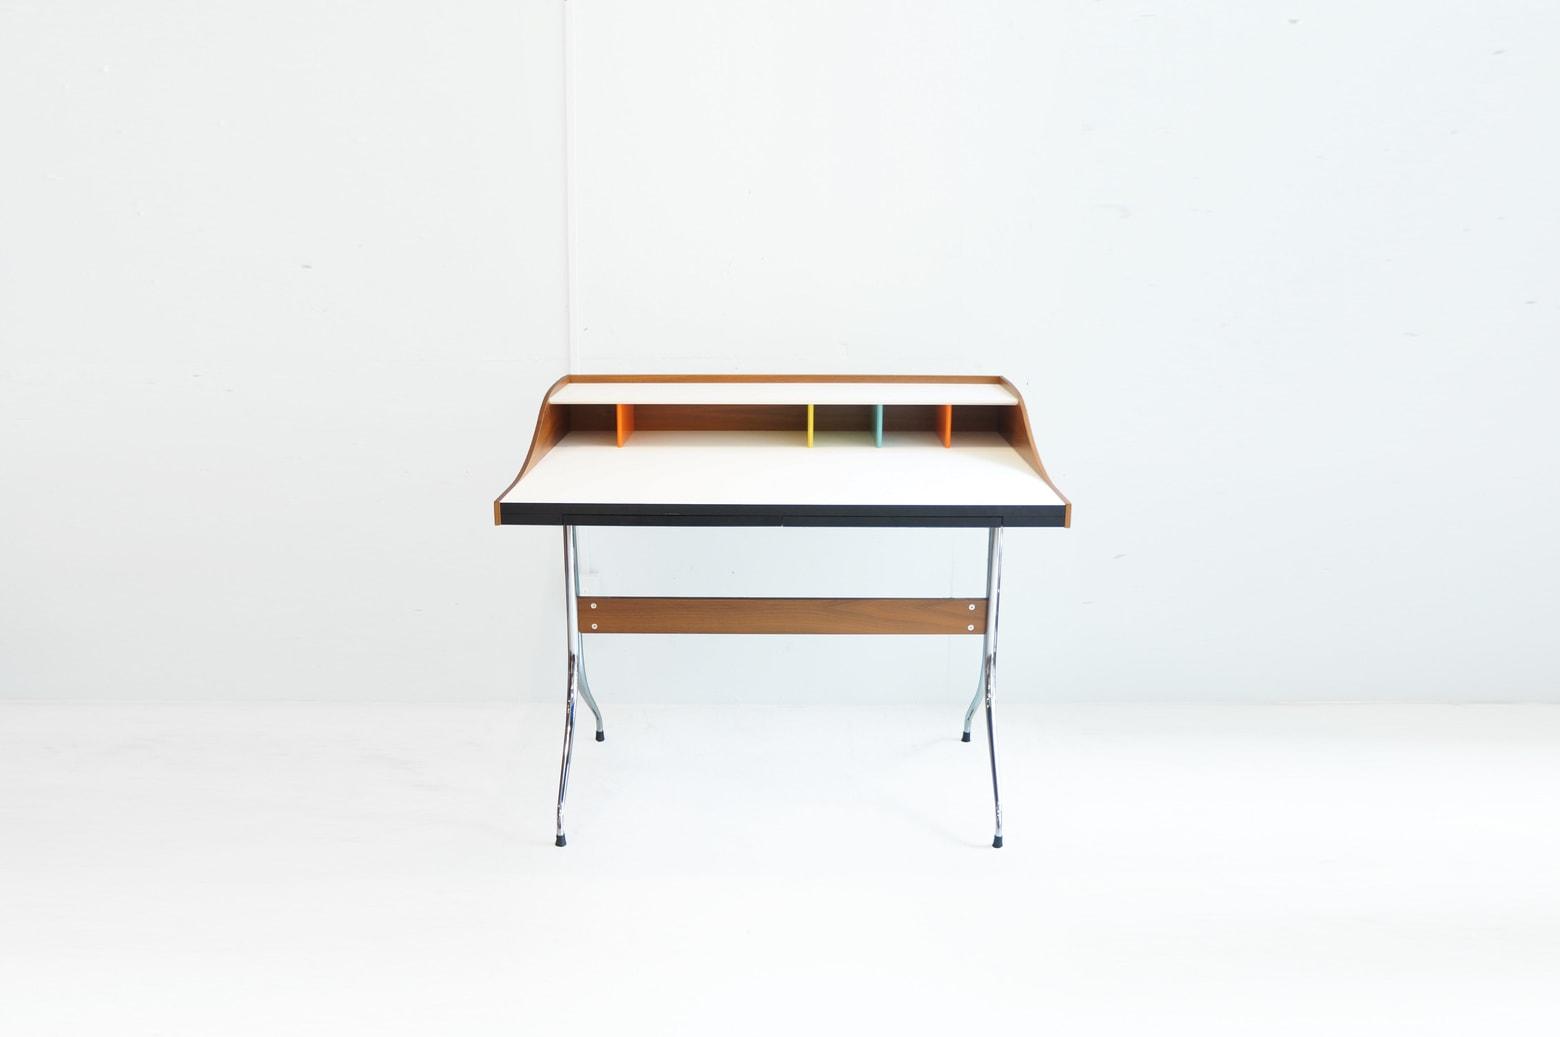 vitra George Nelson design Swag Leg Group Desk / ヴィトラ ジョージ・ネルソン デザイン スワッグレッグ グループデスク